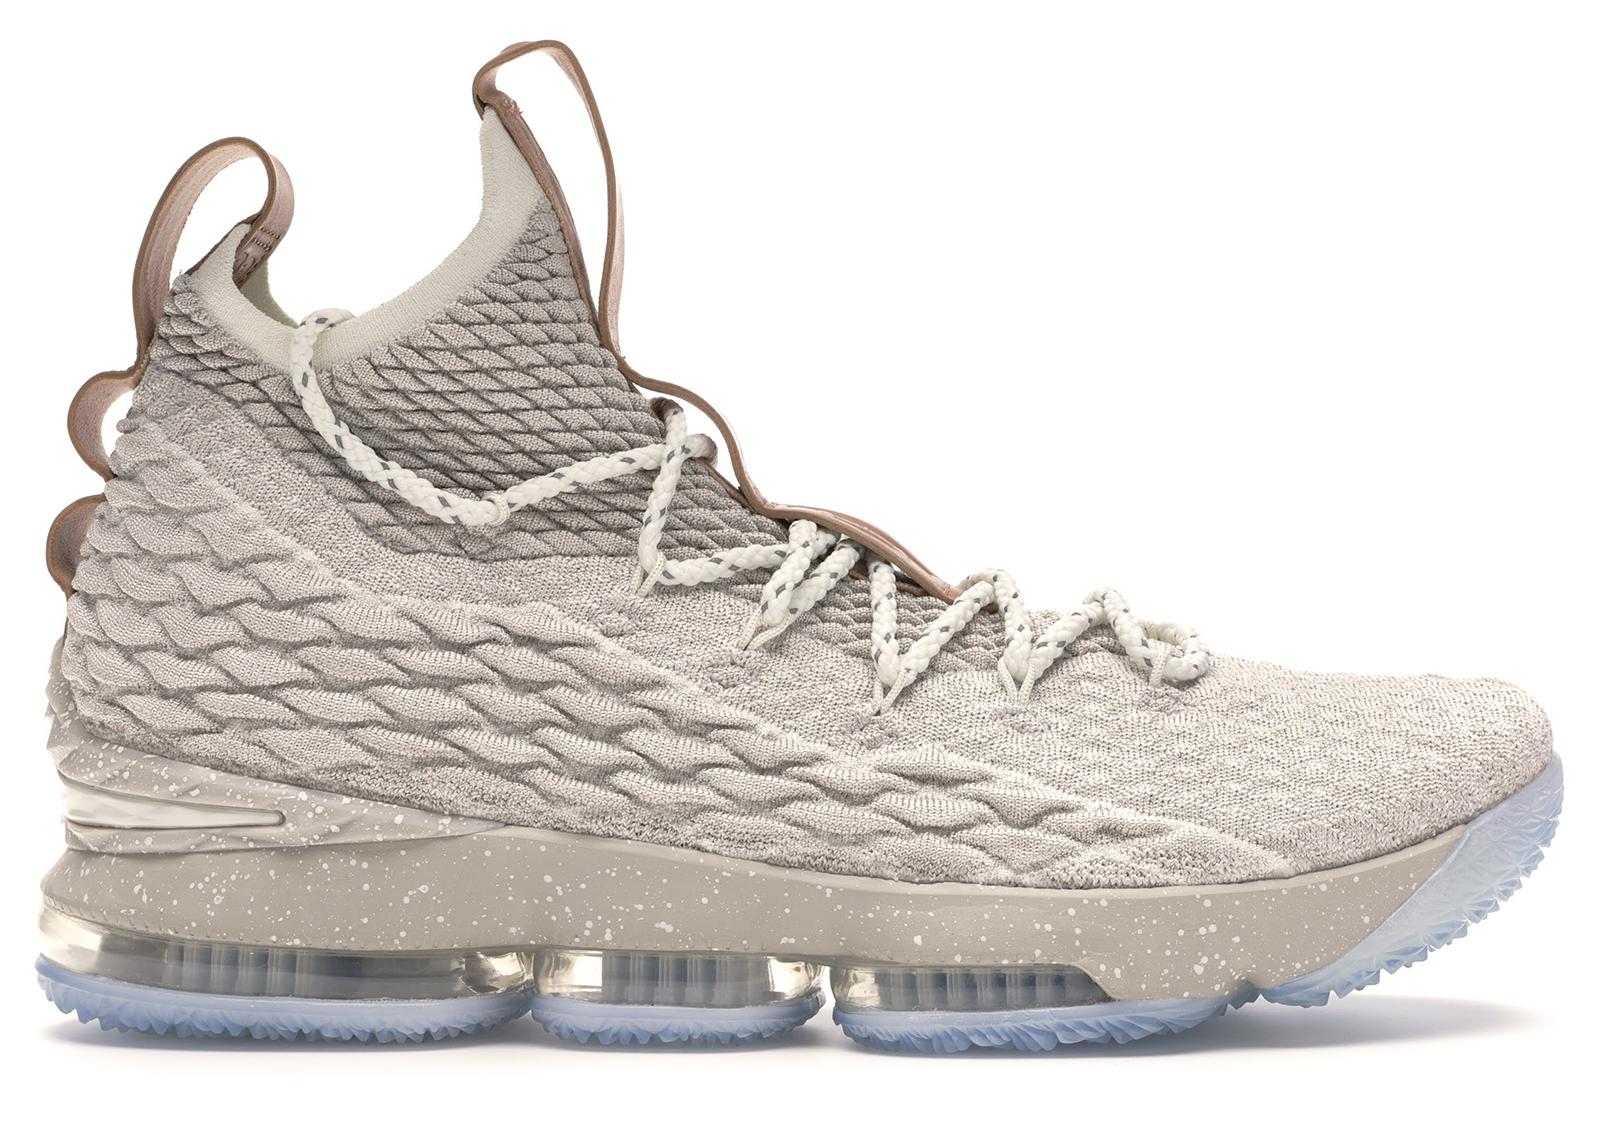 Nike LeBron 15 Ghost - 897648-200